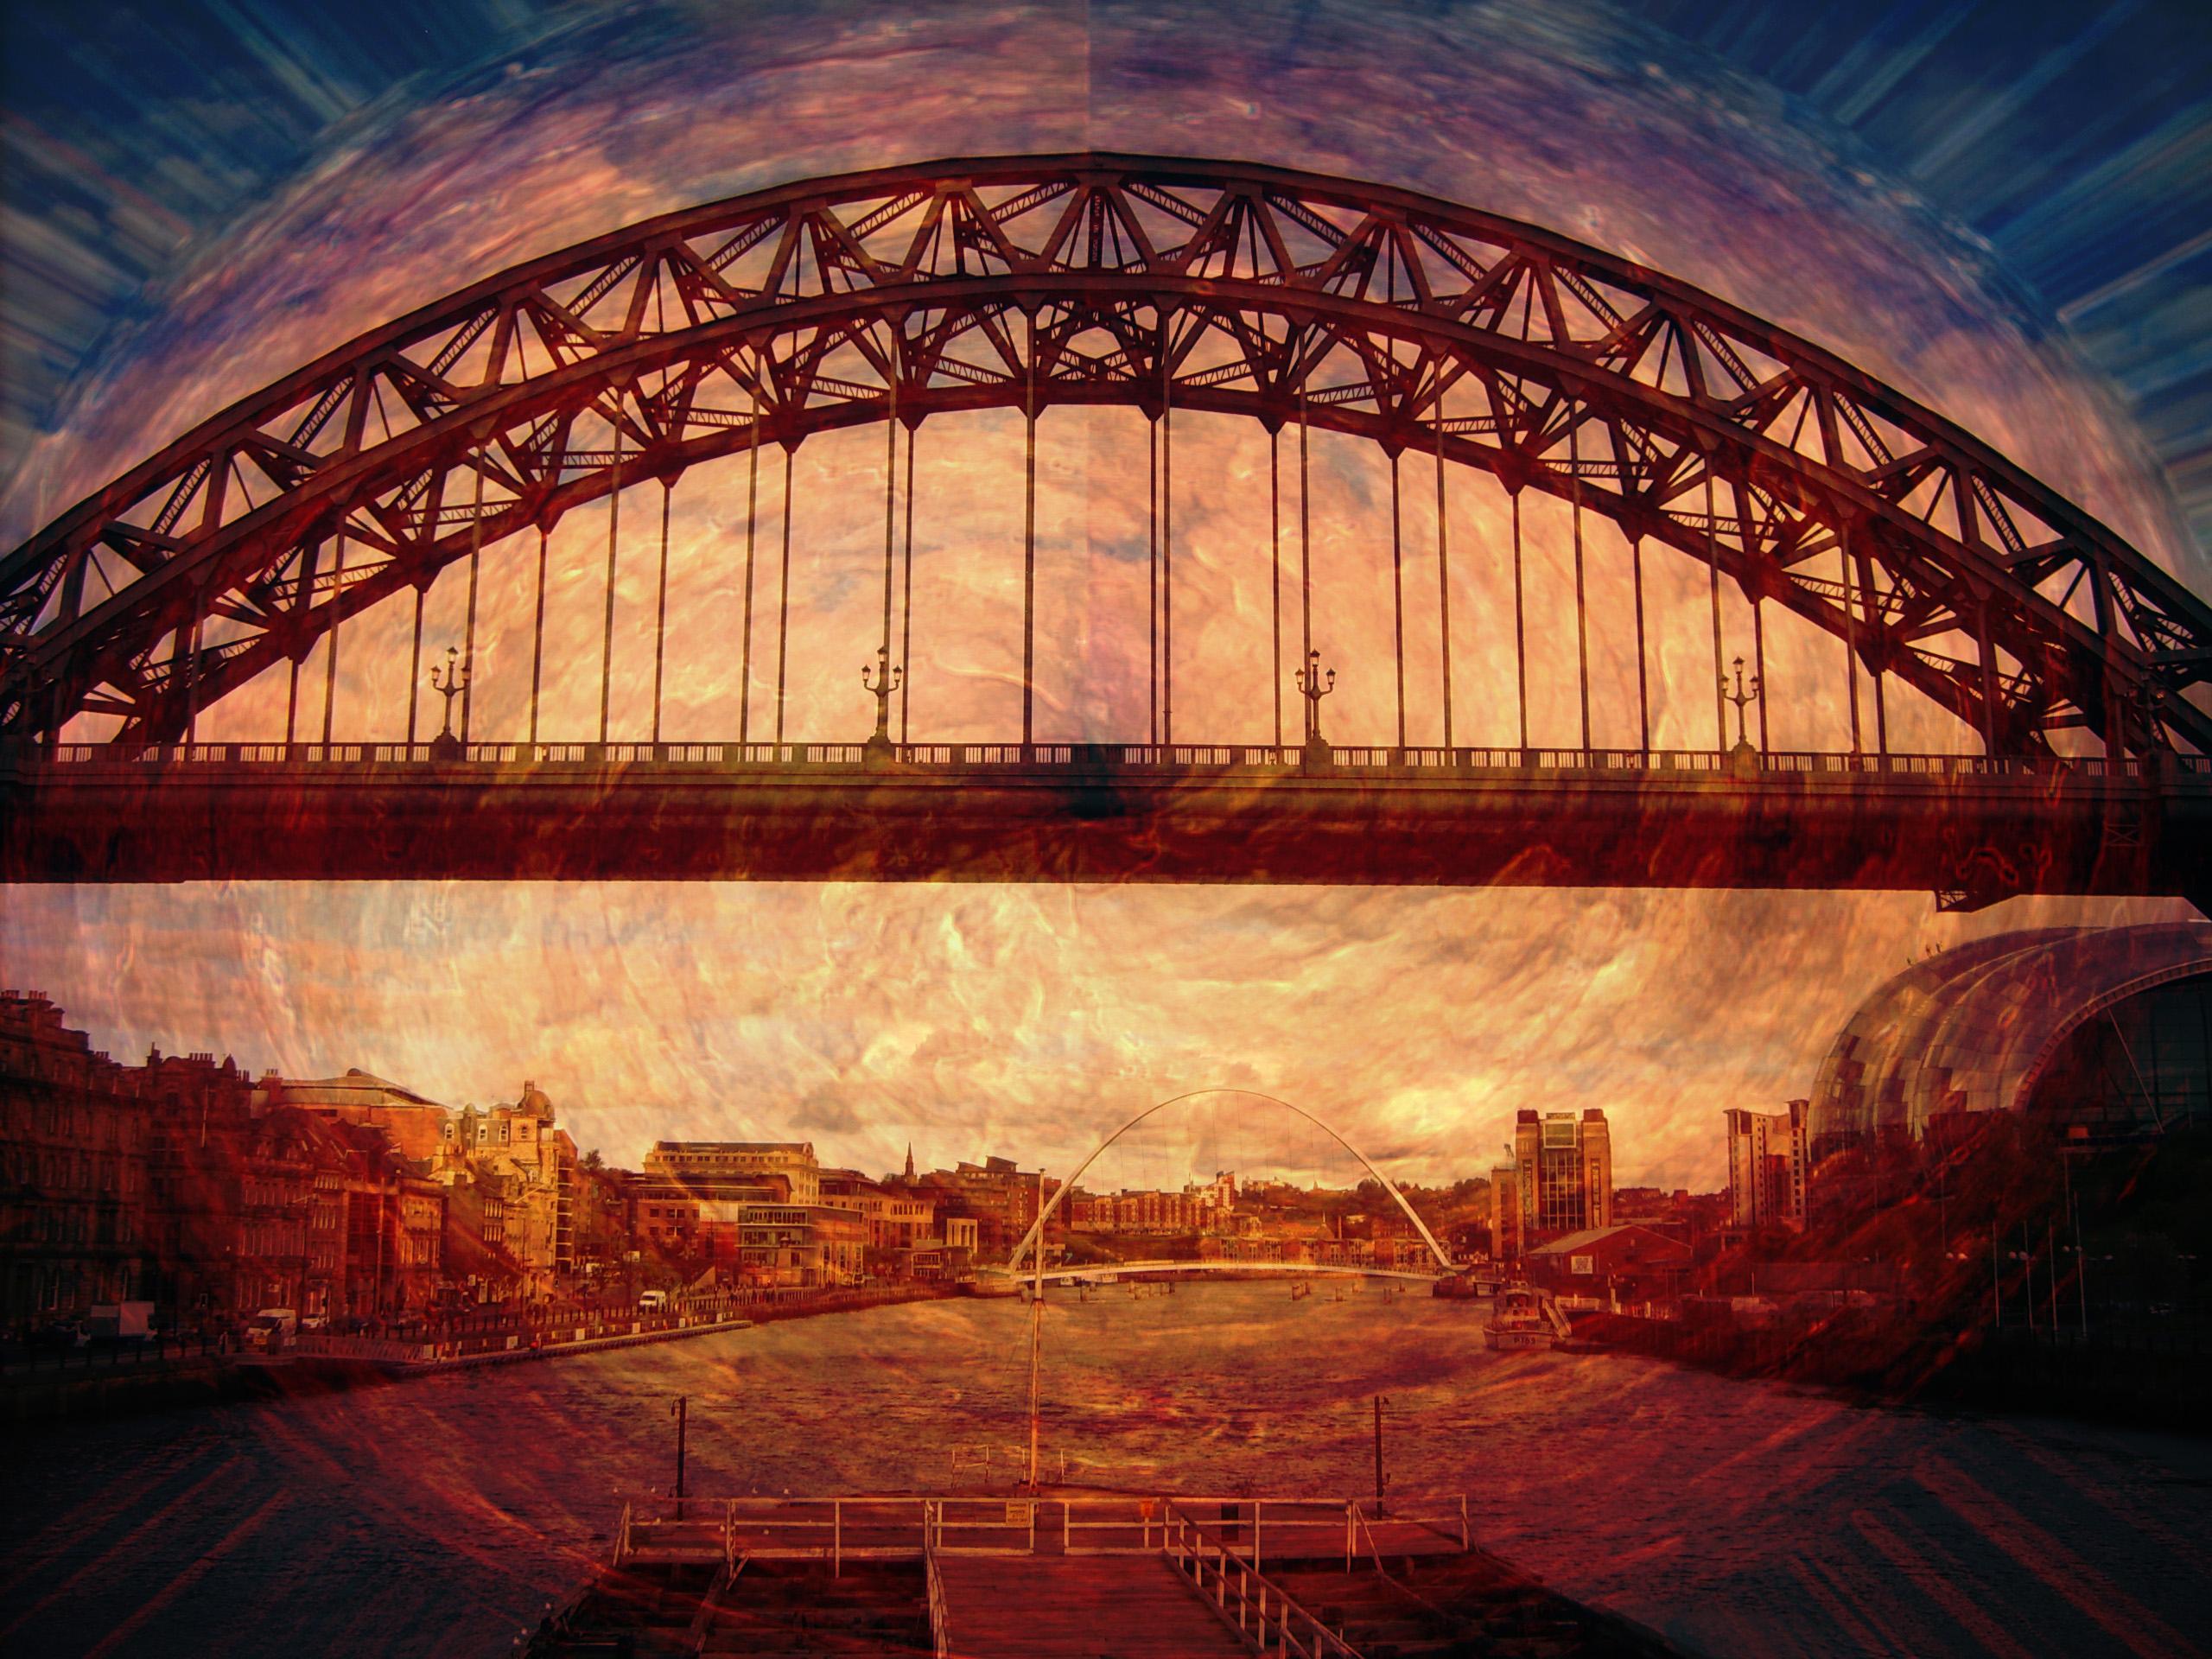 8456 || 2279 || Swurl of the Tyne || £35.00 || 4648